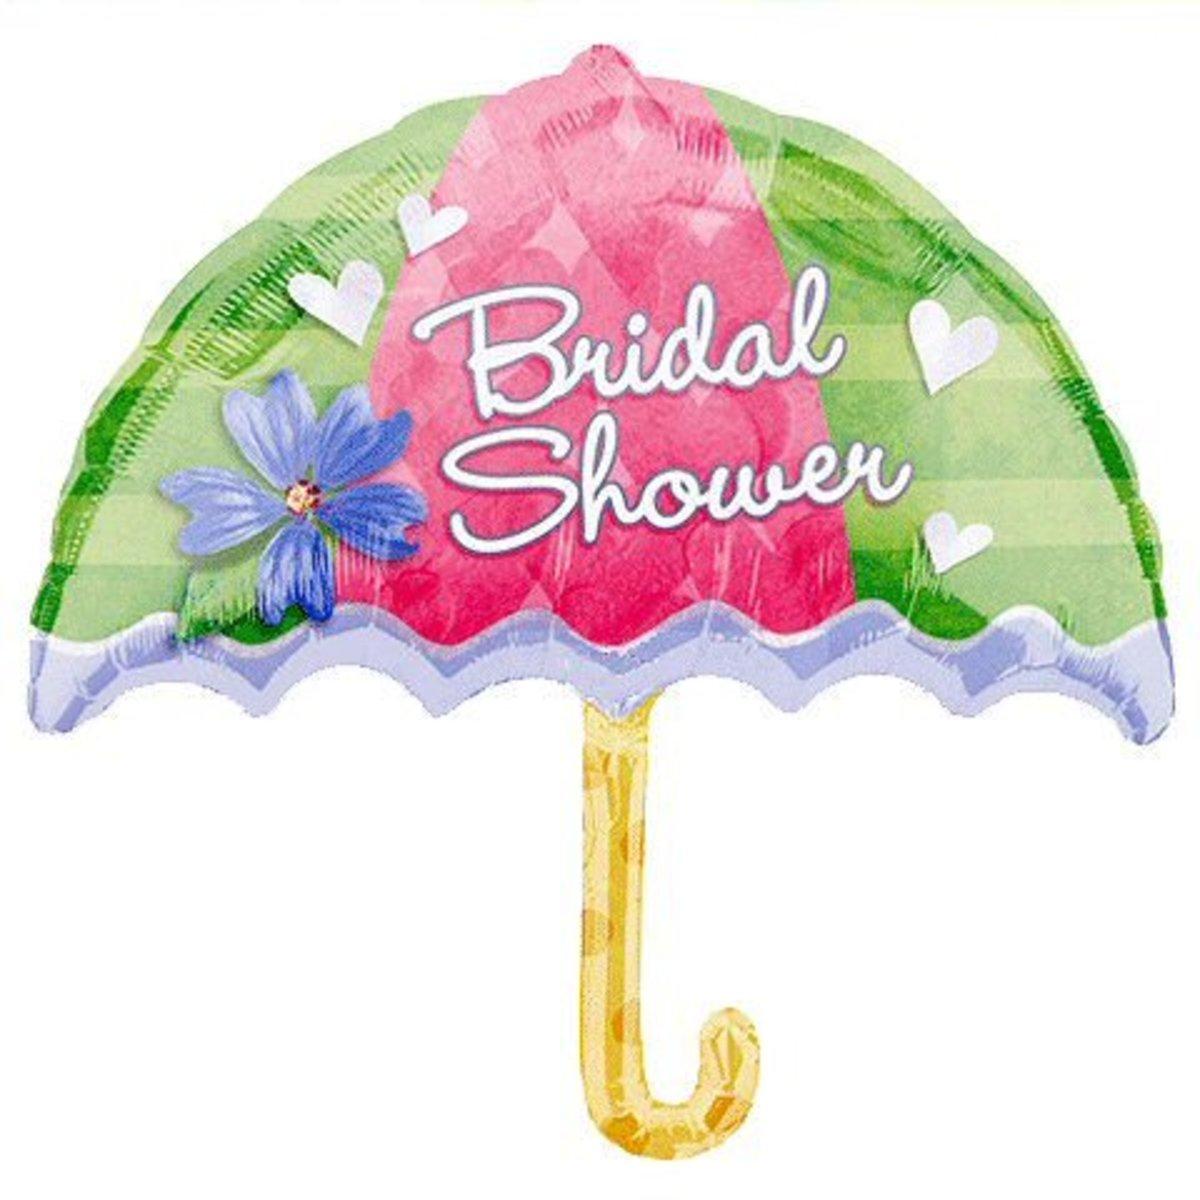 10 Fun Bridal Shower Game Ideas Holidappy Celebrations